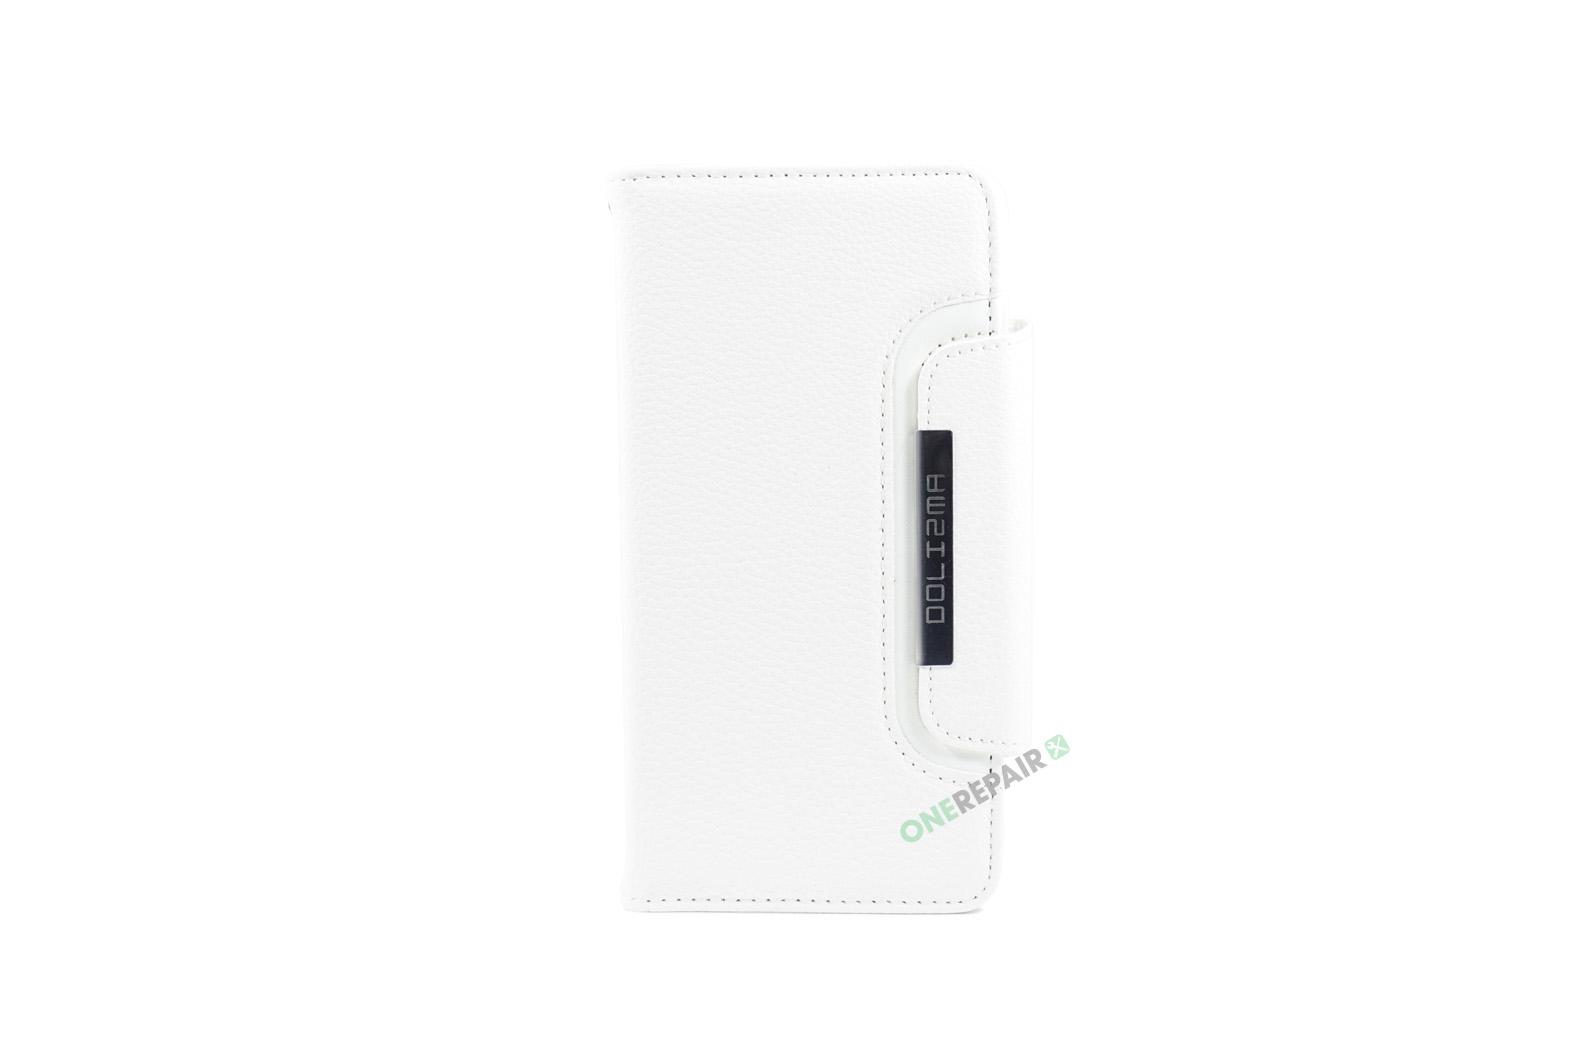 iPhone 7 Plus, iPhone 8 Plus, Flipcover, Cover, Plads til kort, Etui, Hvid